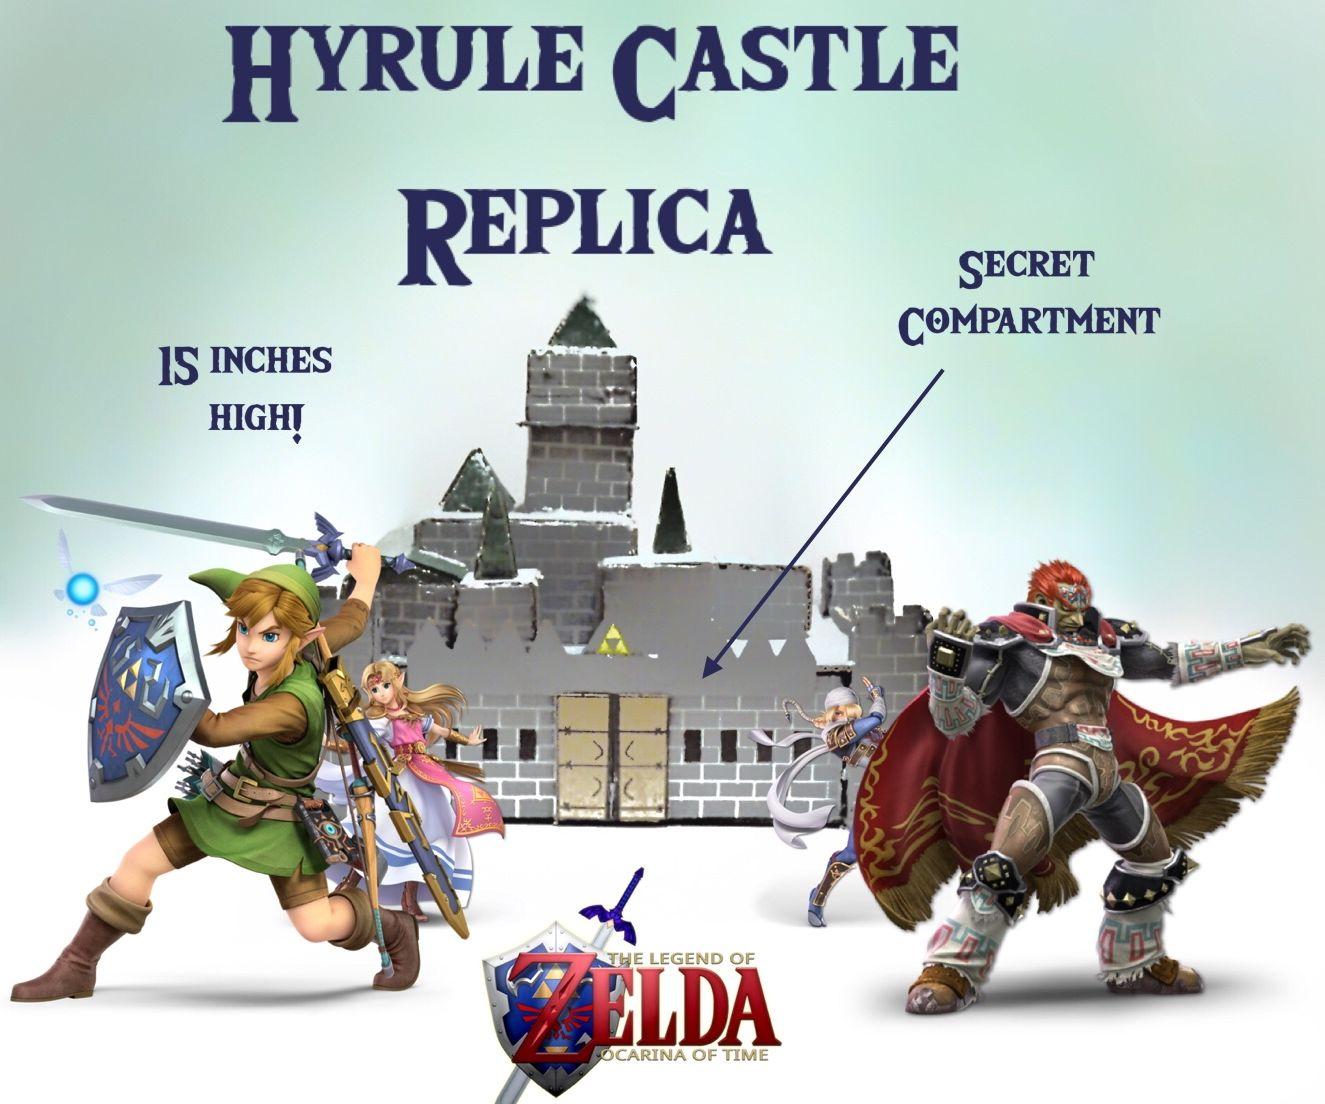 Hyrule Castle Replica W/ Secret Compartment